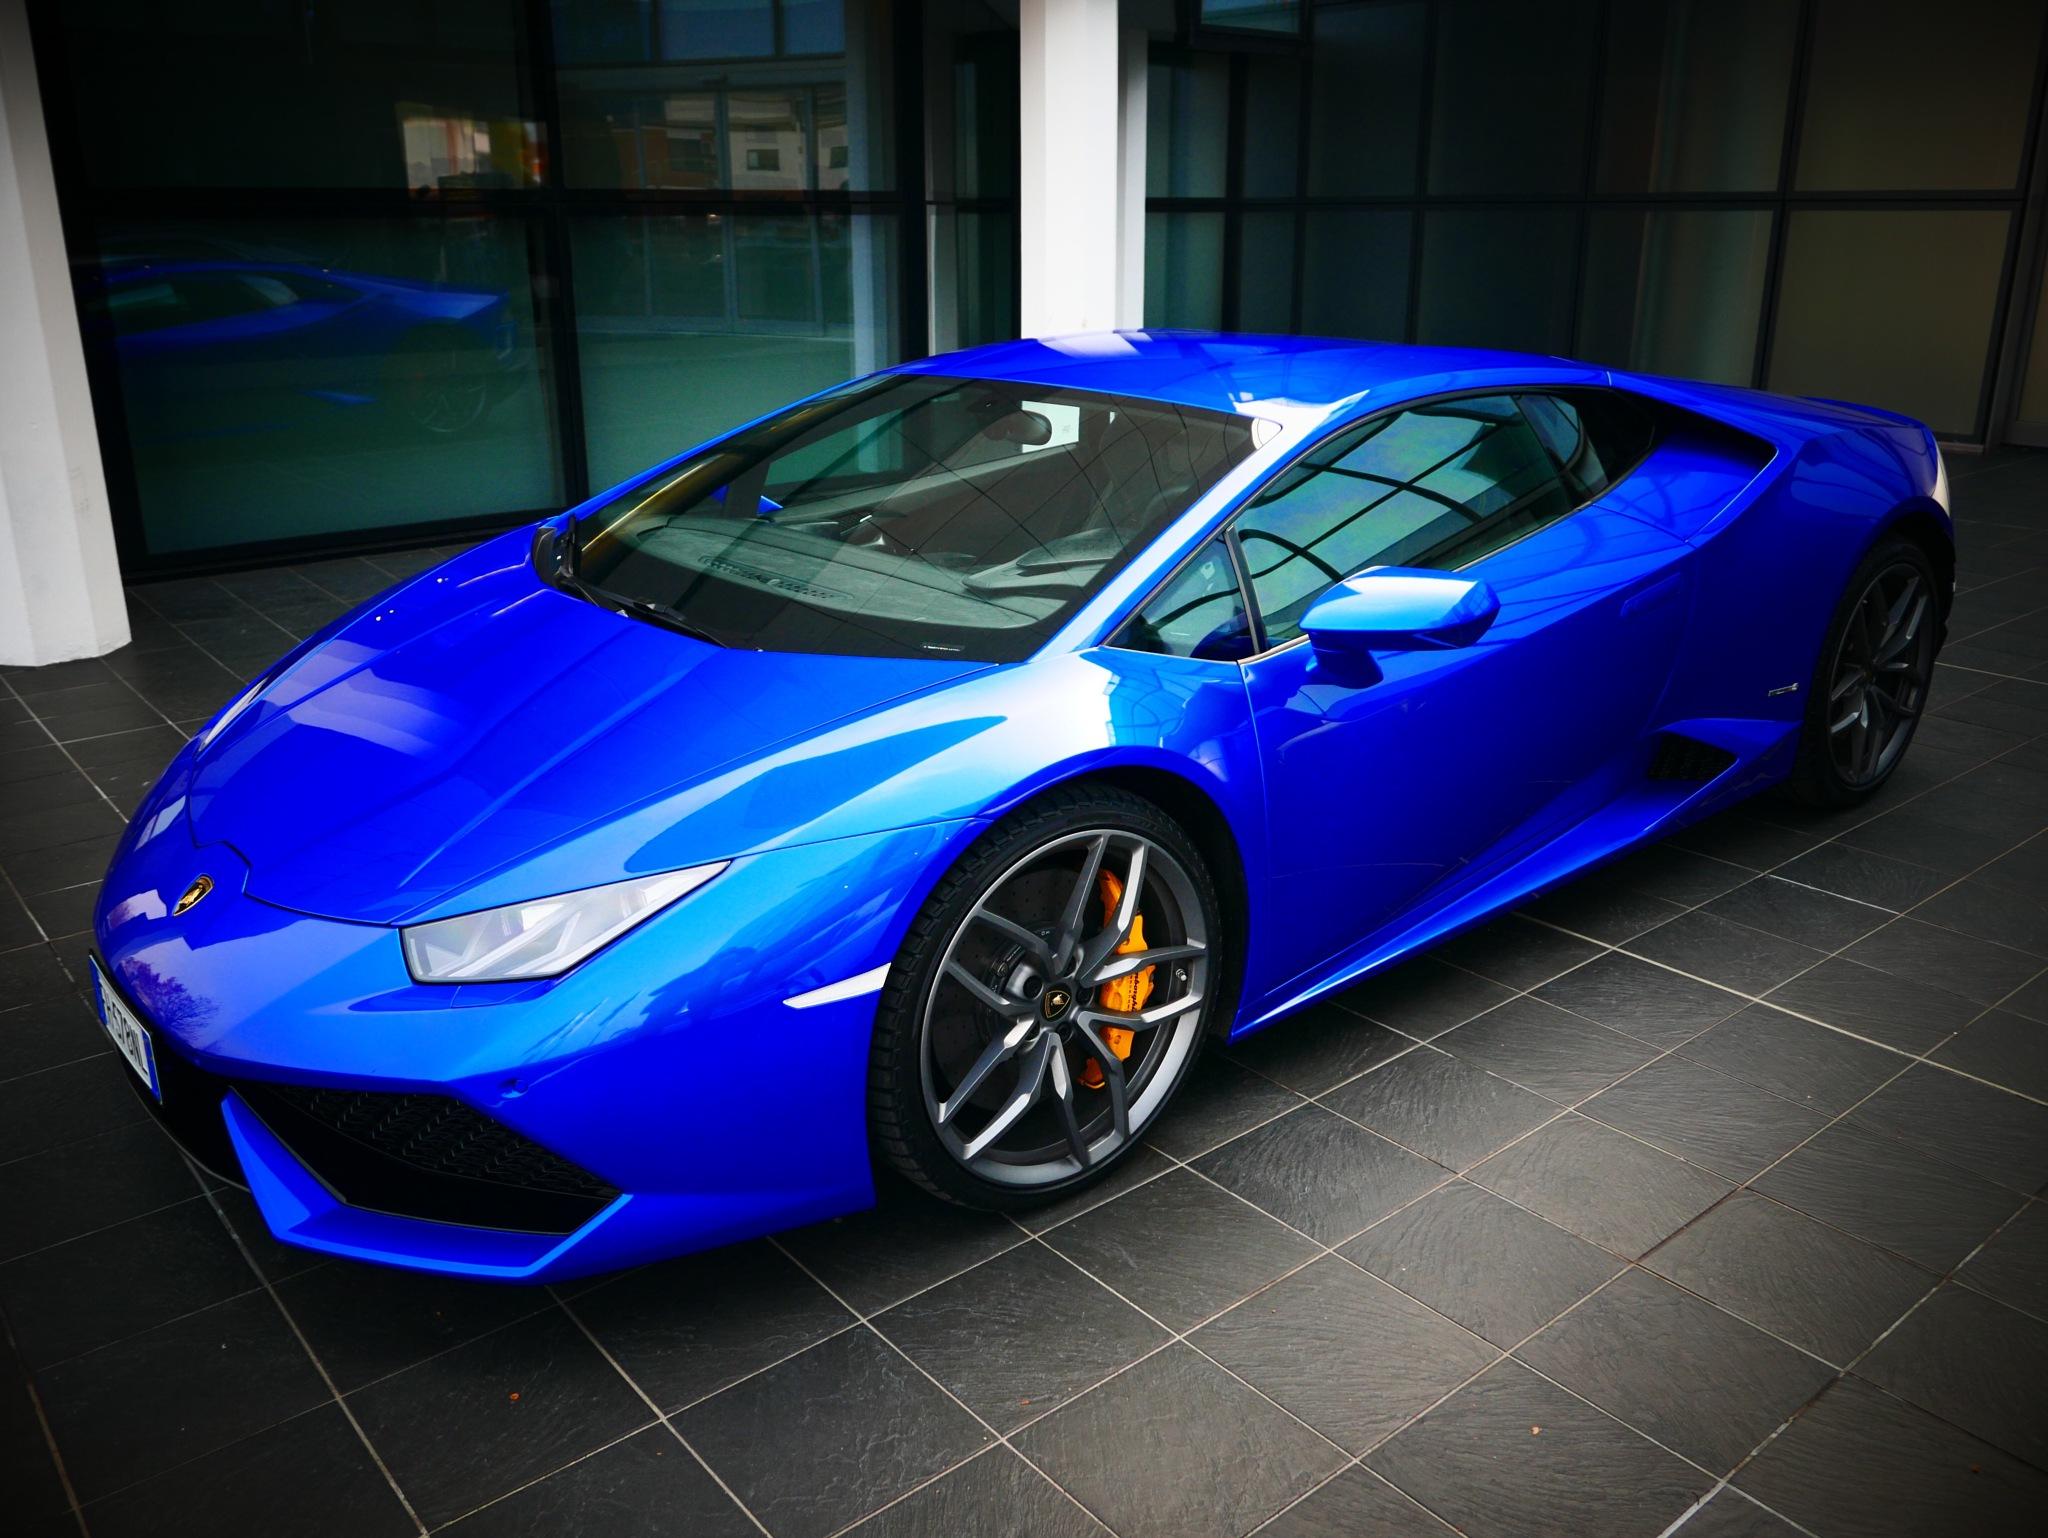 Blue Lamborghini  by Mau056